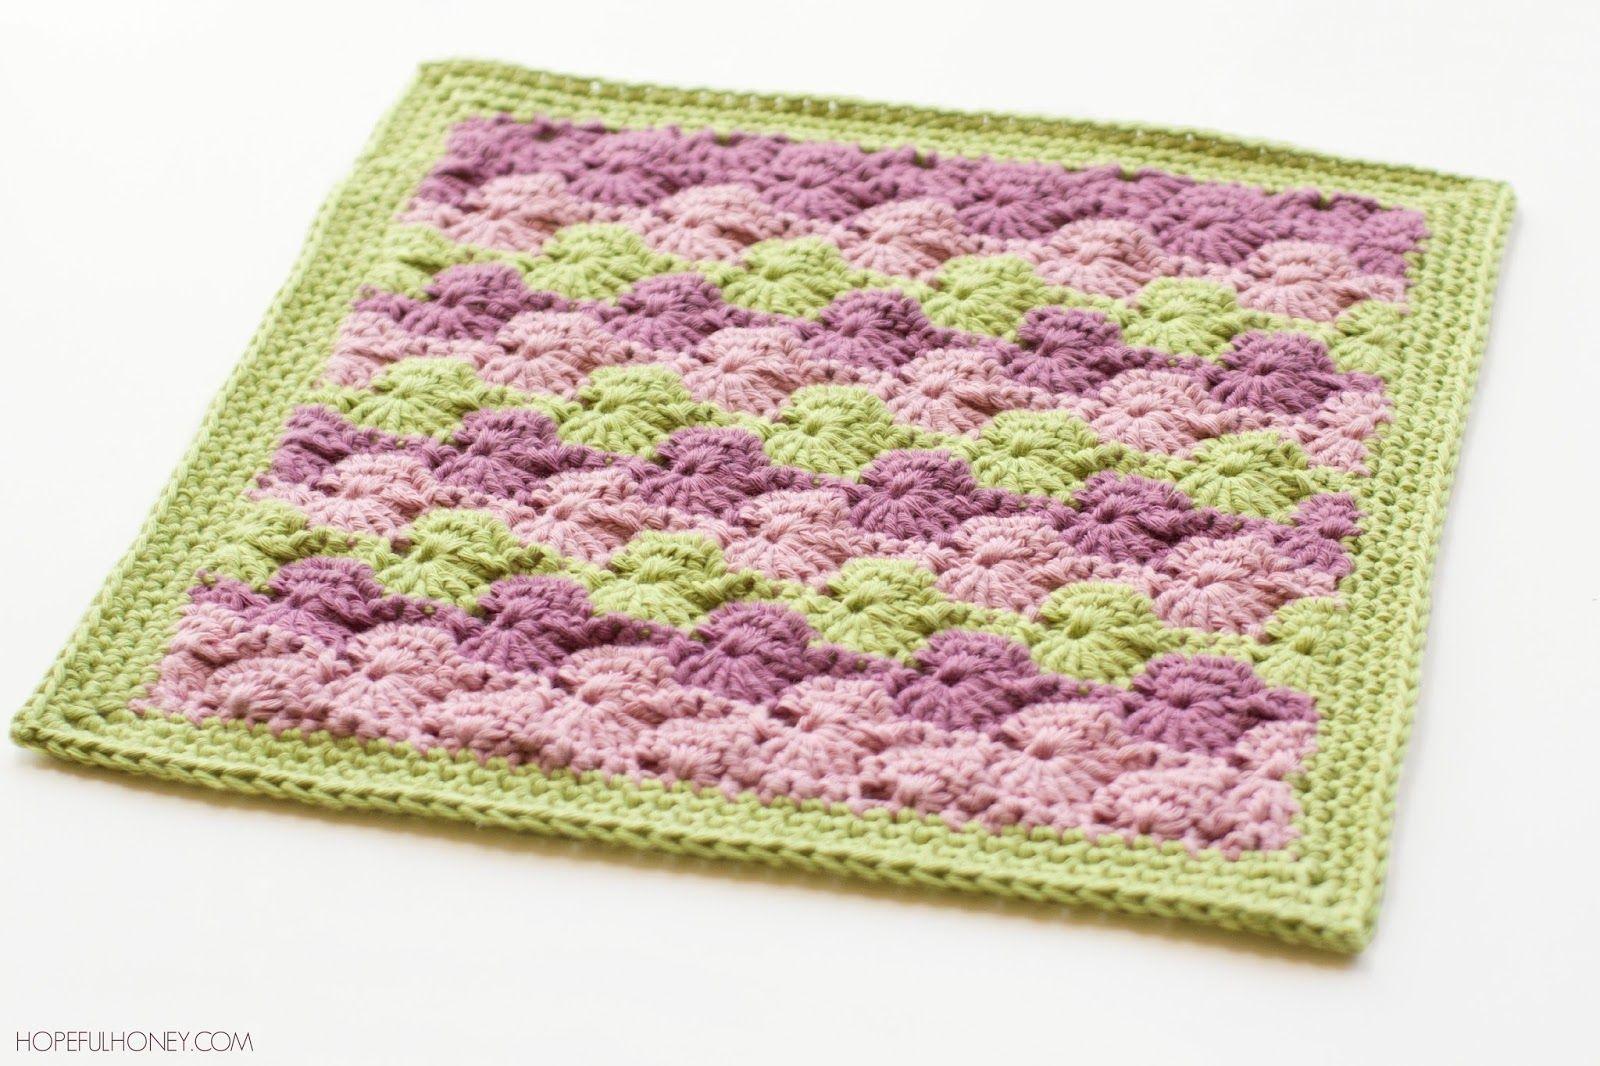 Meadow Afghan Square Crochet Pattern